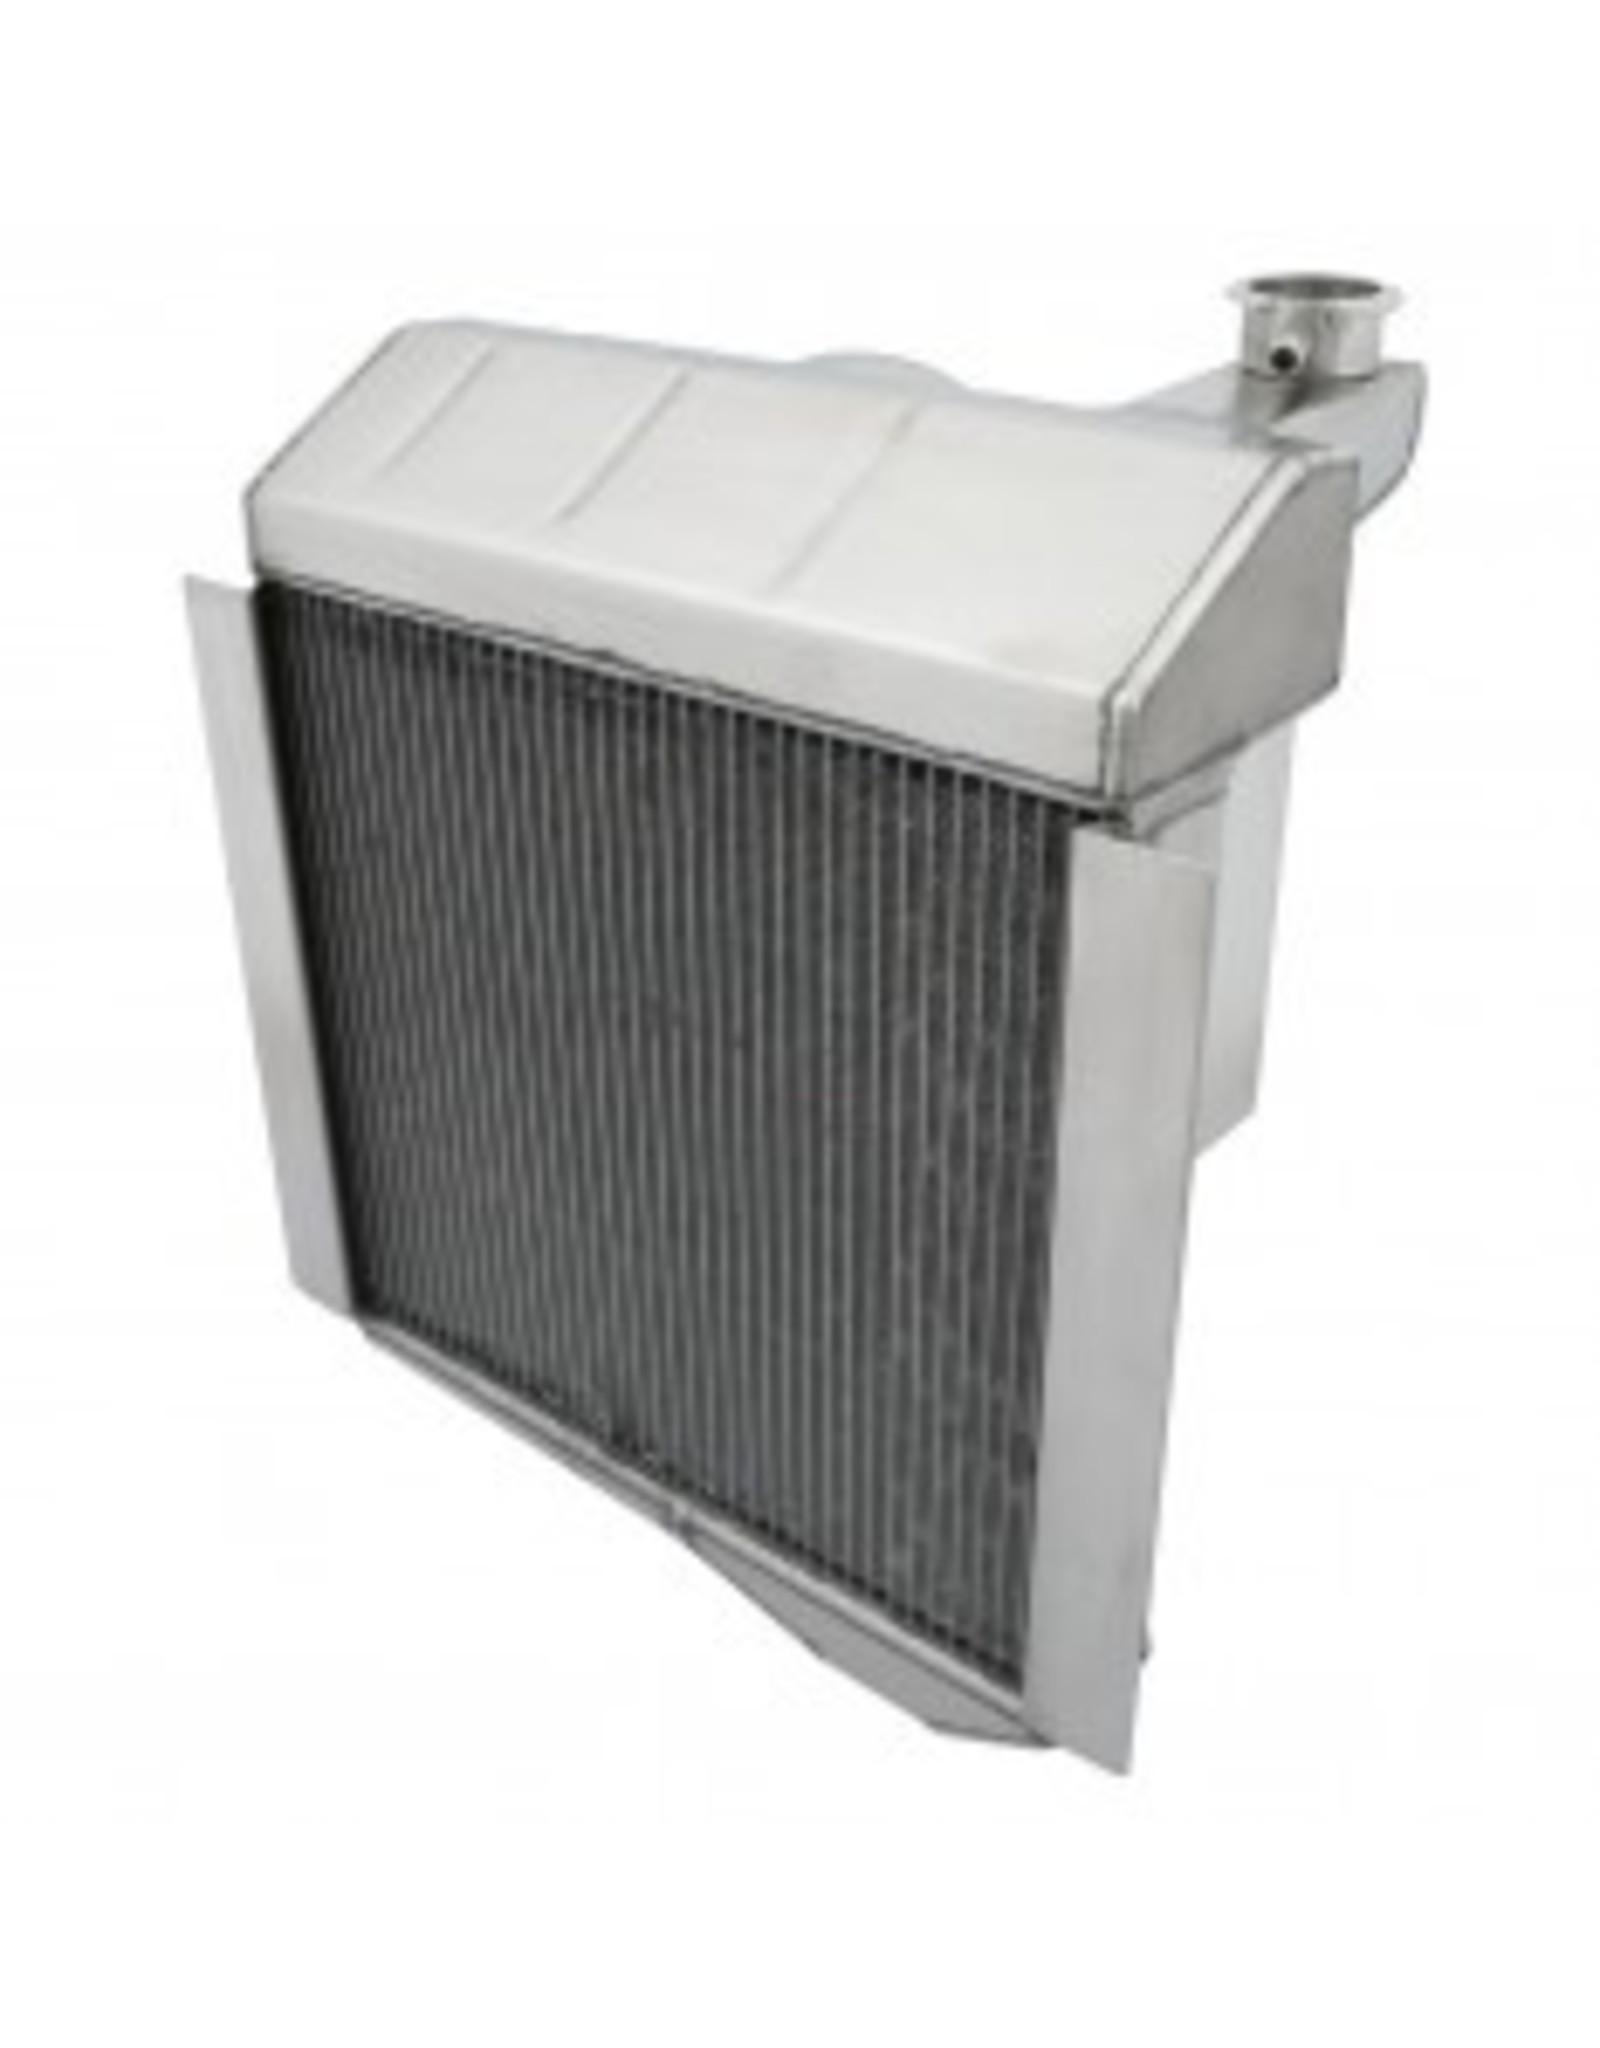 Revotec MG Midget  Vertical Flow Radiator Cooling Fan Kit